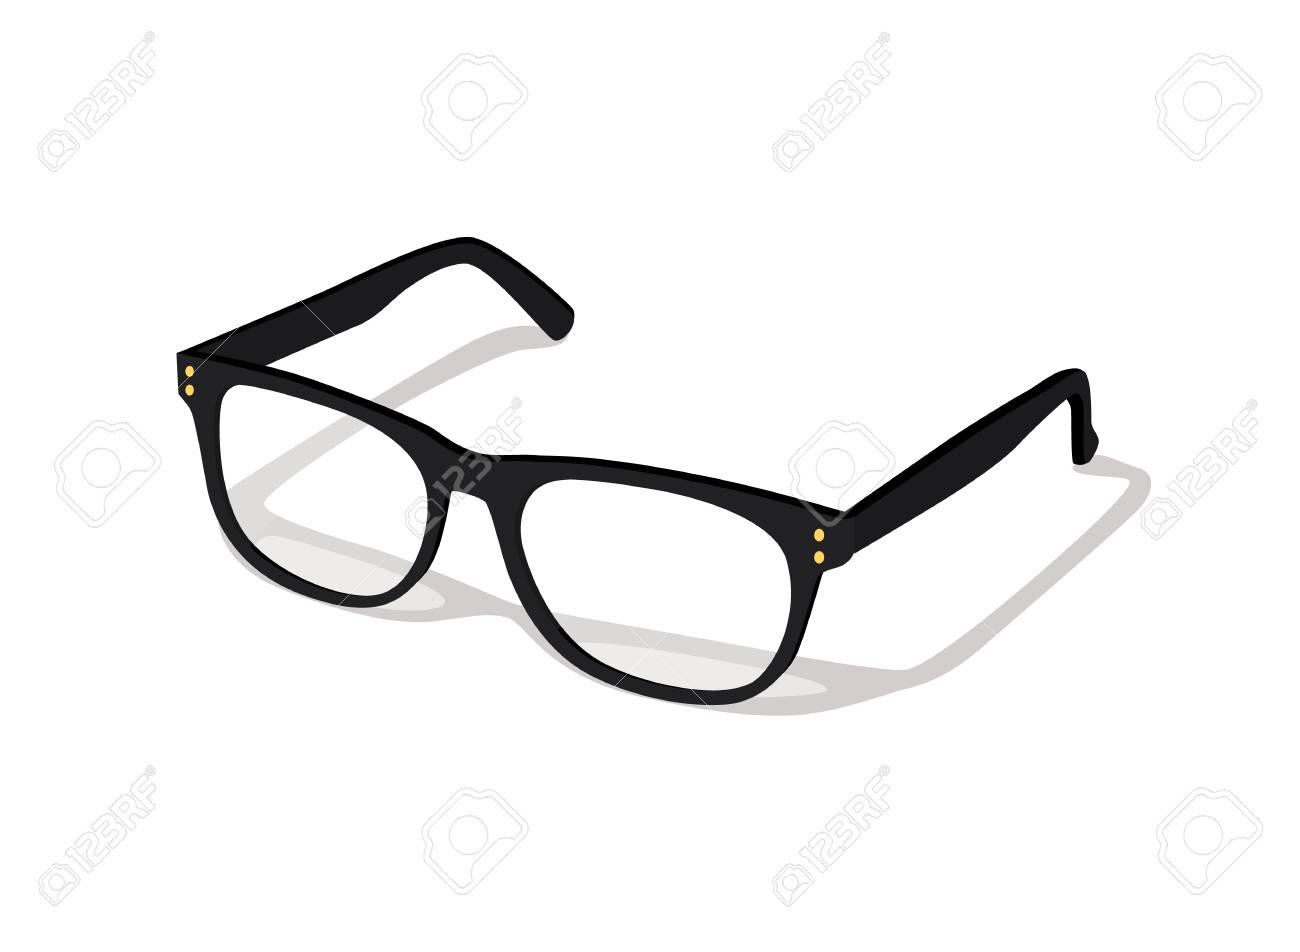 Modern glasses icon isolated on white background vector illustration of elegance spectacles in black frame, eyeglasses with lense, eyewear model - 105540727